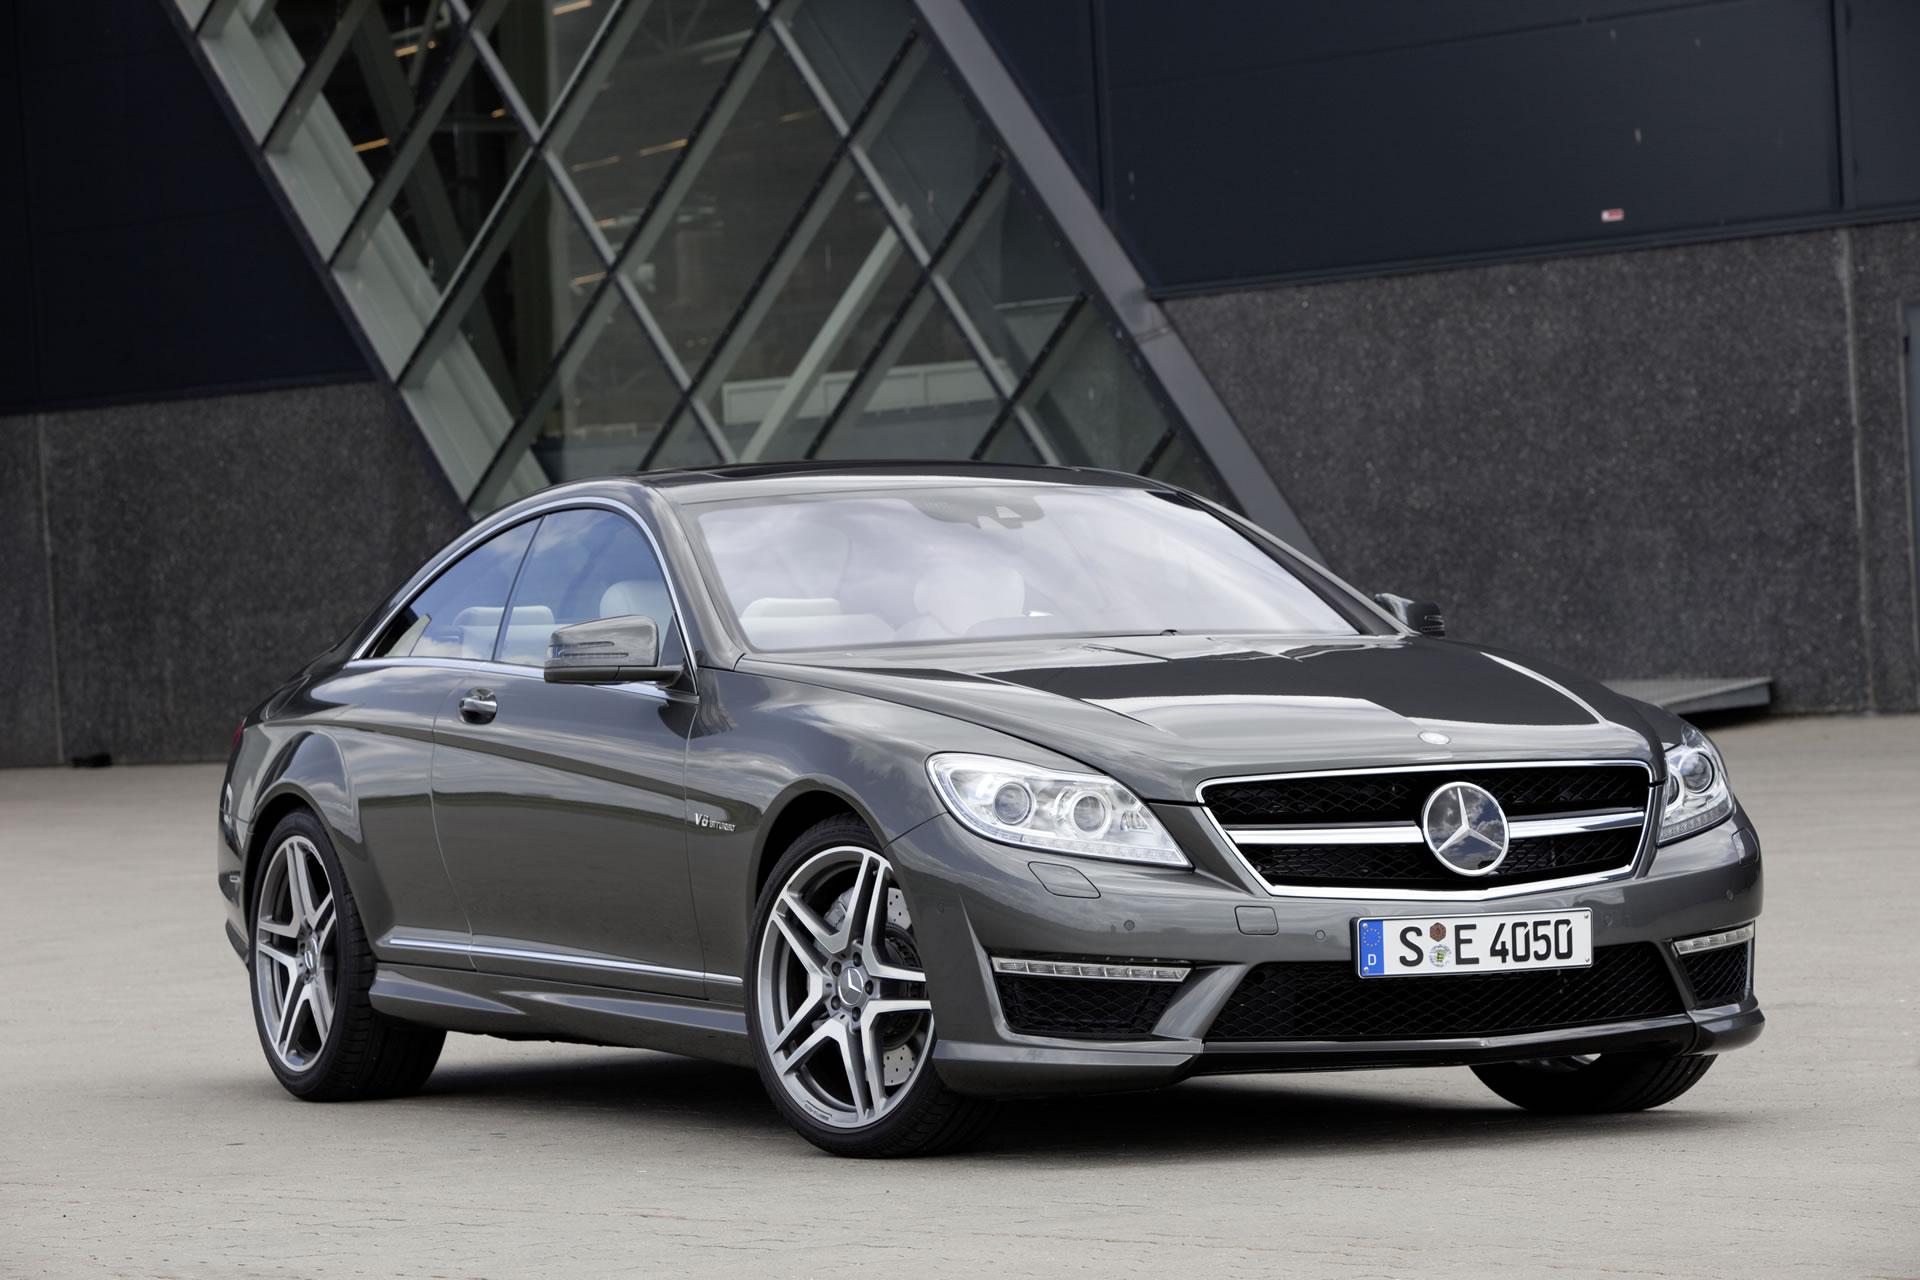 Mercedes-Benz CL 63 AMG High Resolution Wallpaper Free